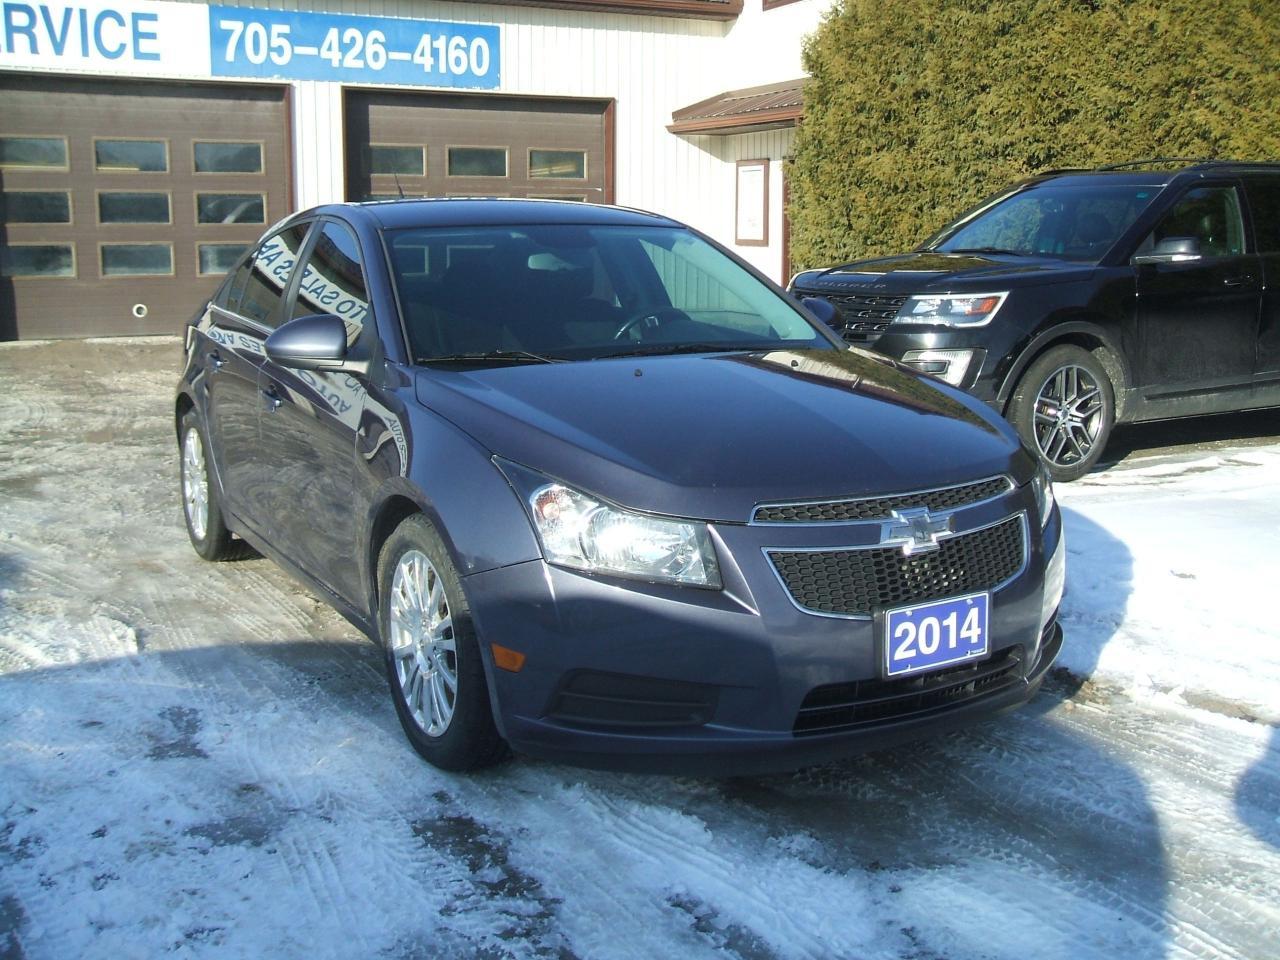 Photo of Steel Blue 2014 Chevrolet Cruze